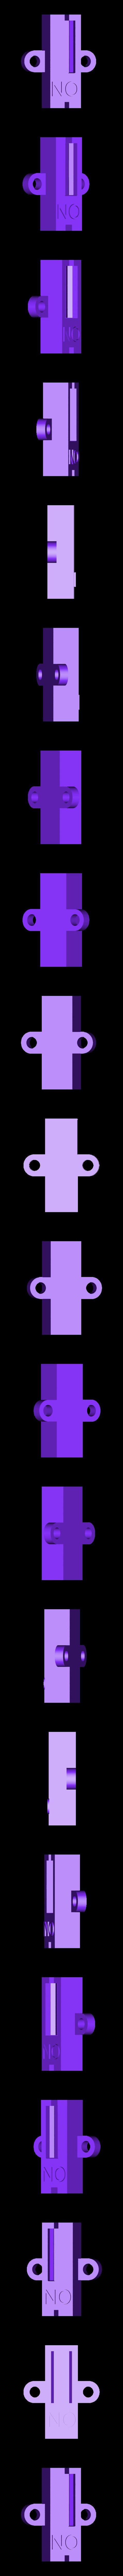 Switch_Casing.stl Download free STL file Single Pin Switch • 3D print object, PentlandDesigns